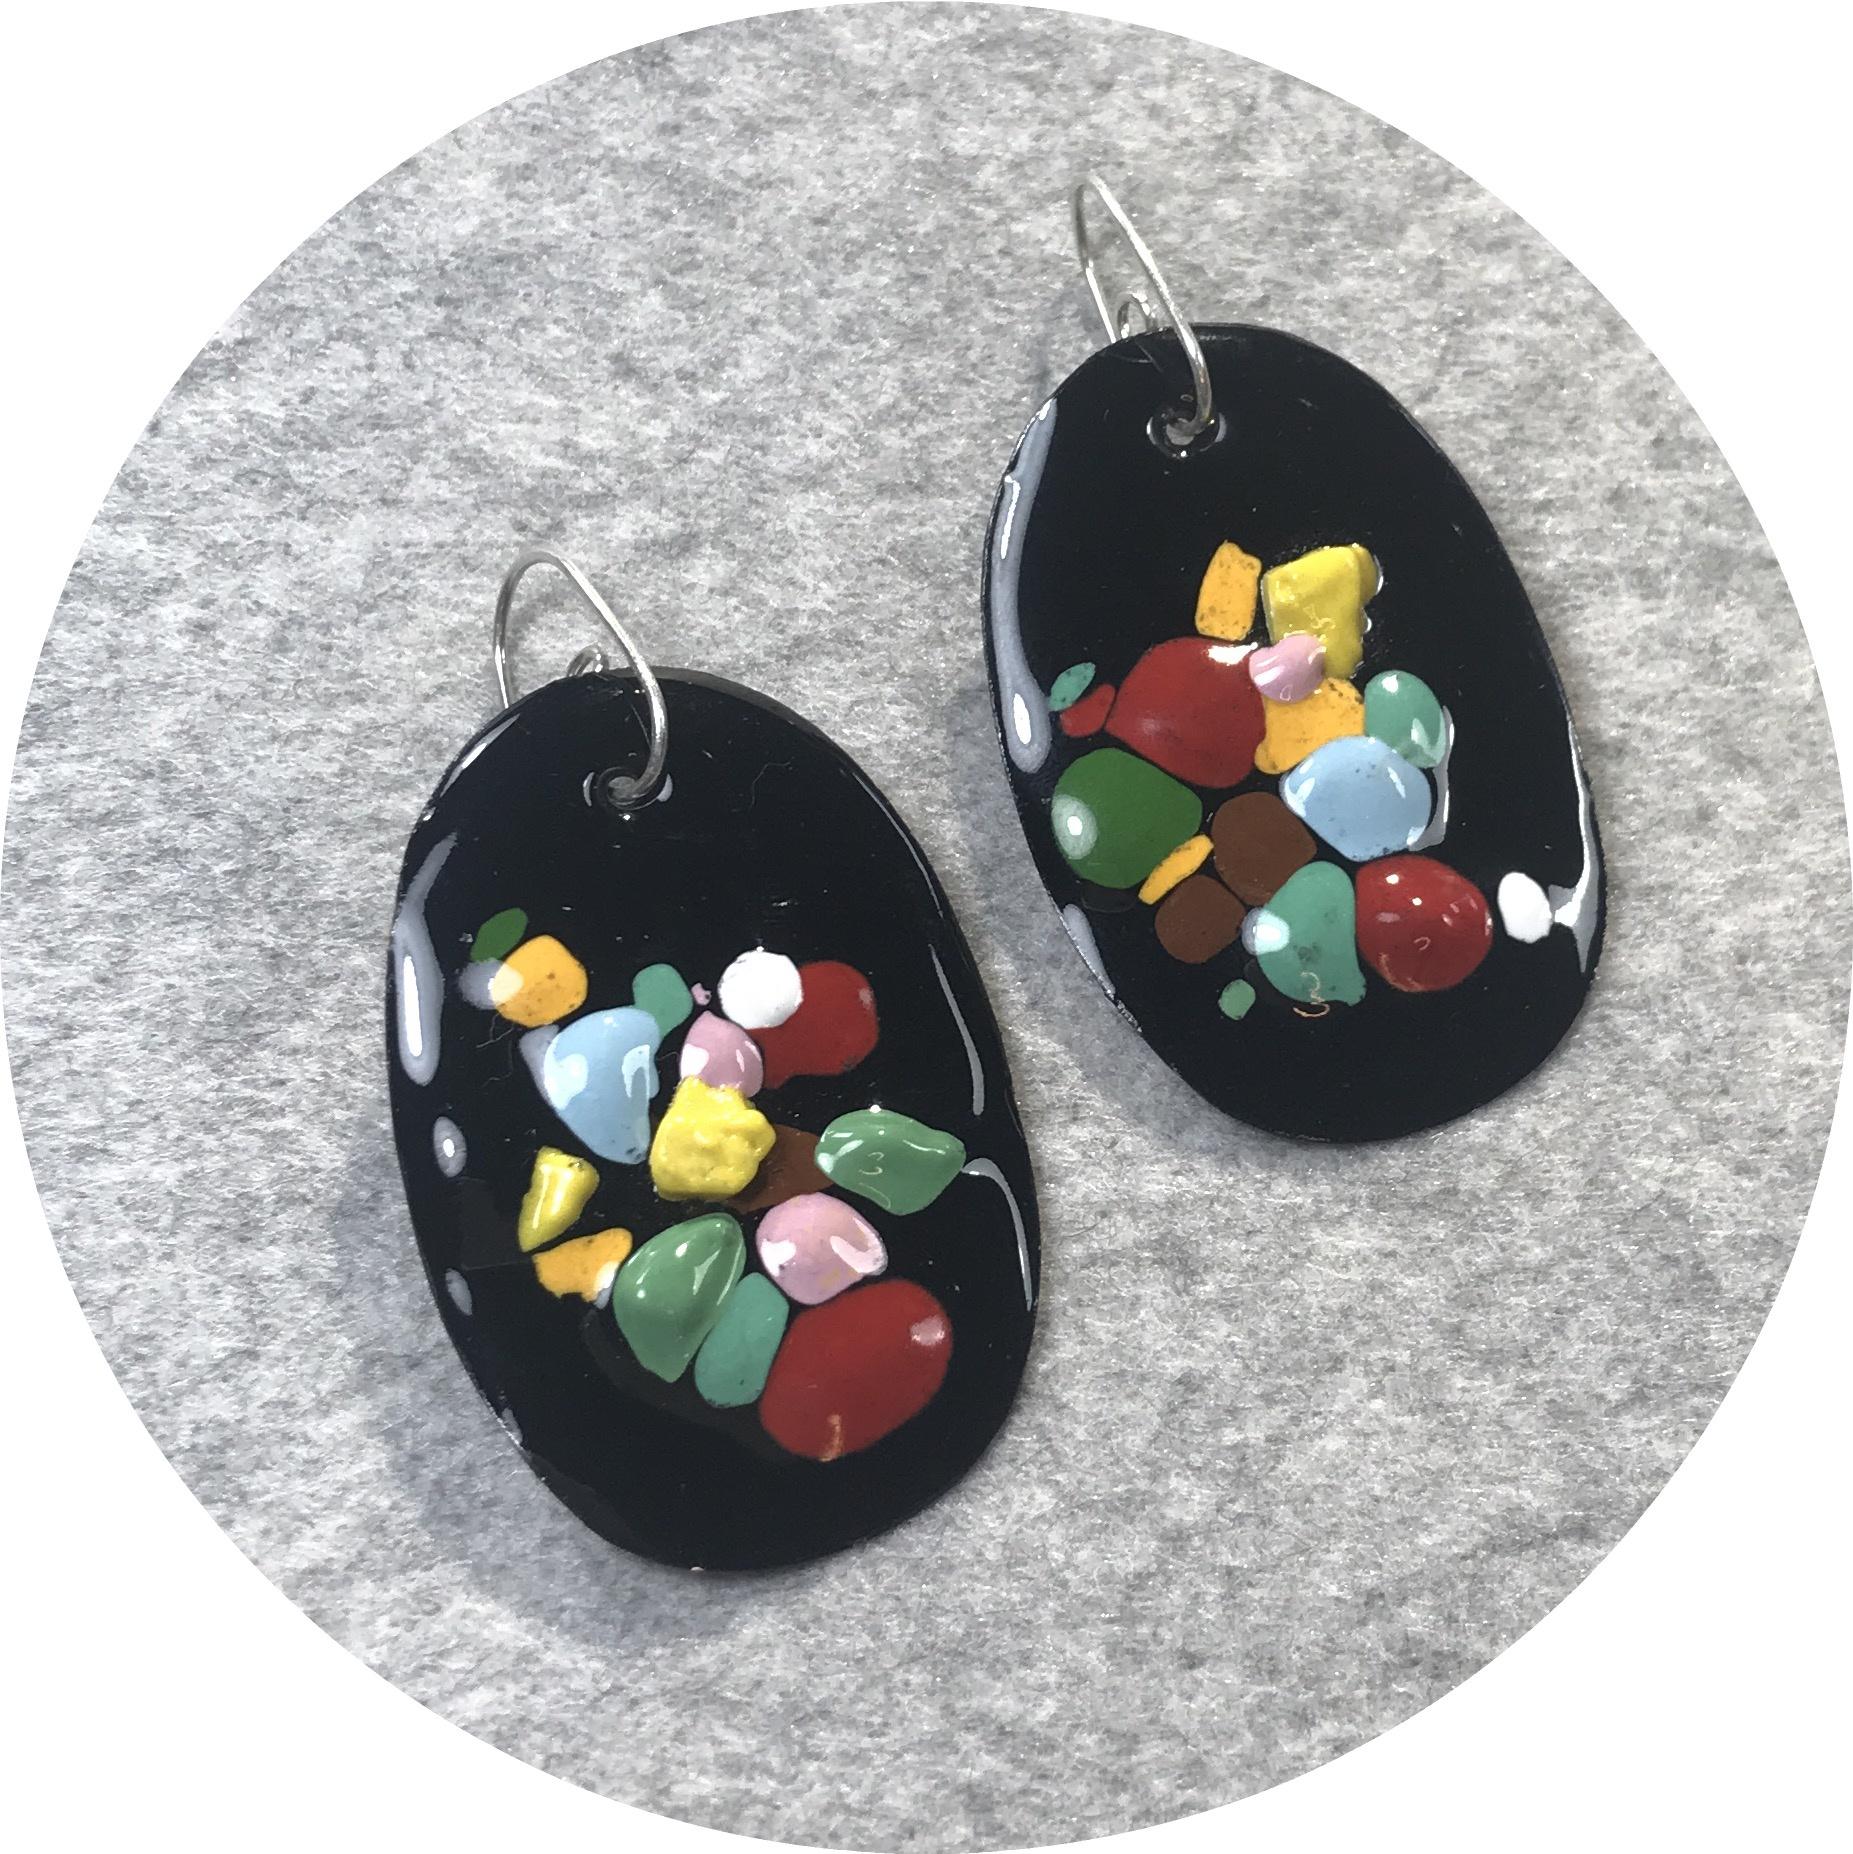 Jenna O'Brien - Medium Queenie Earrings in Black enamel with colourful flecks